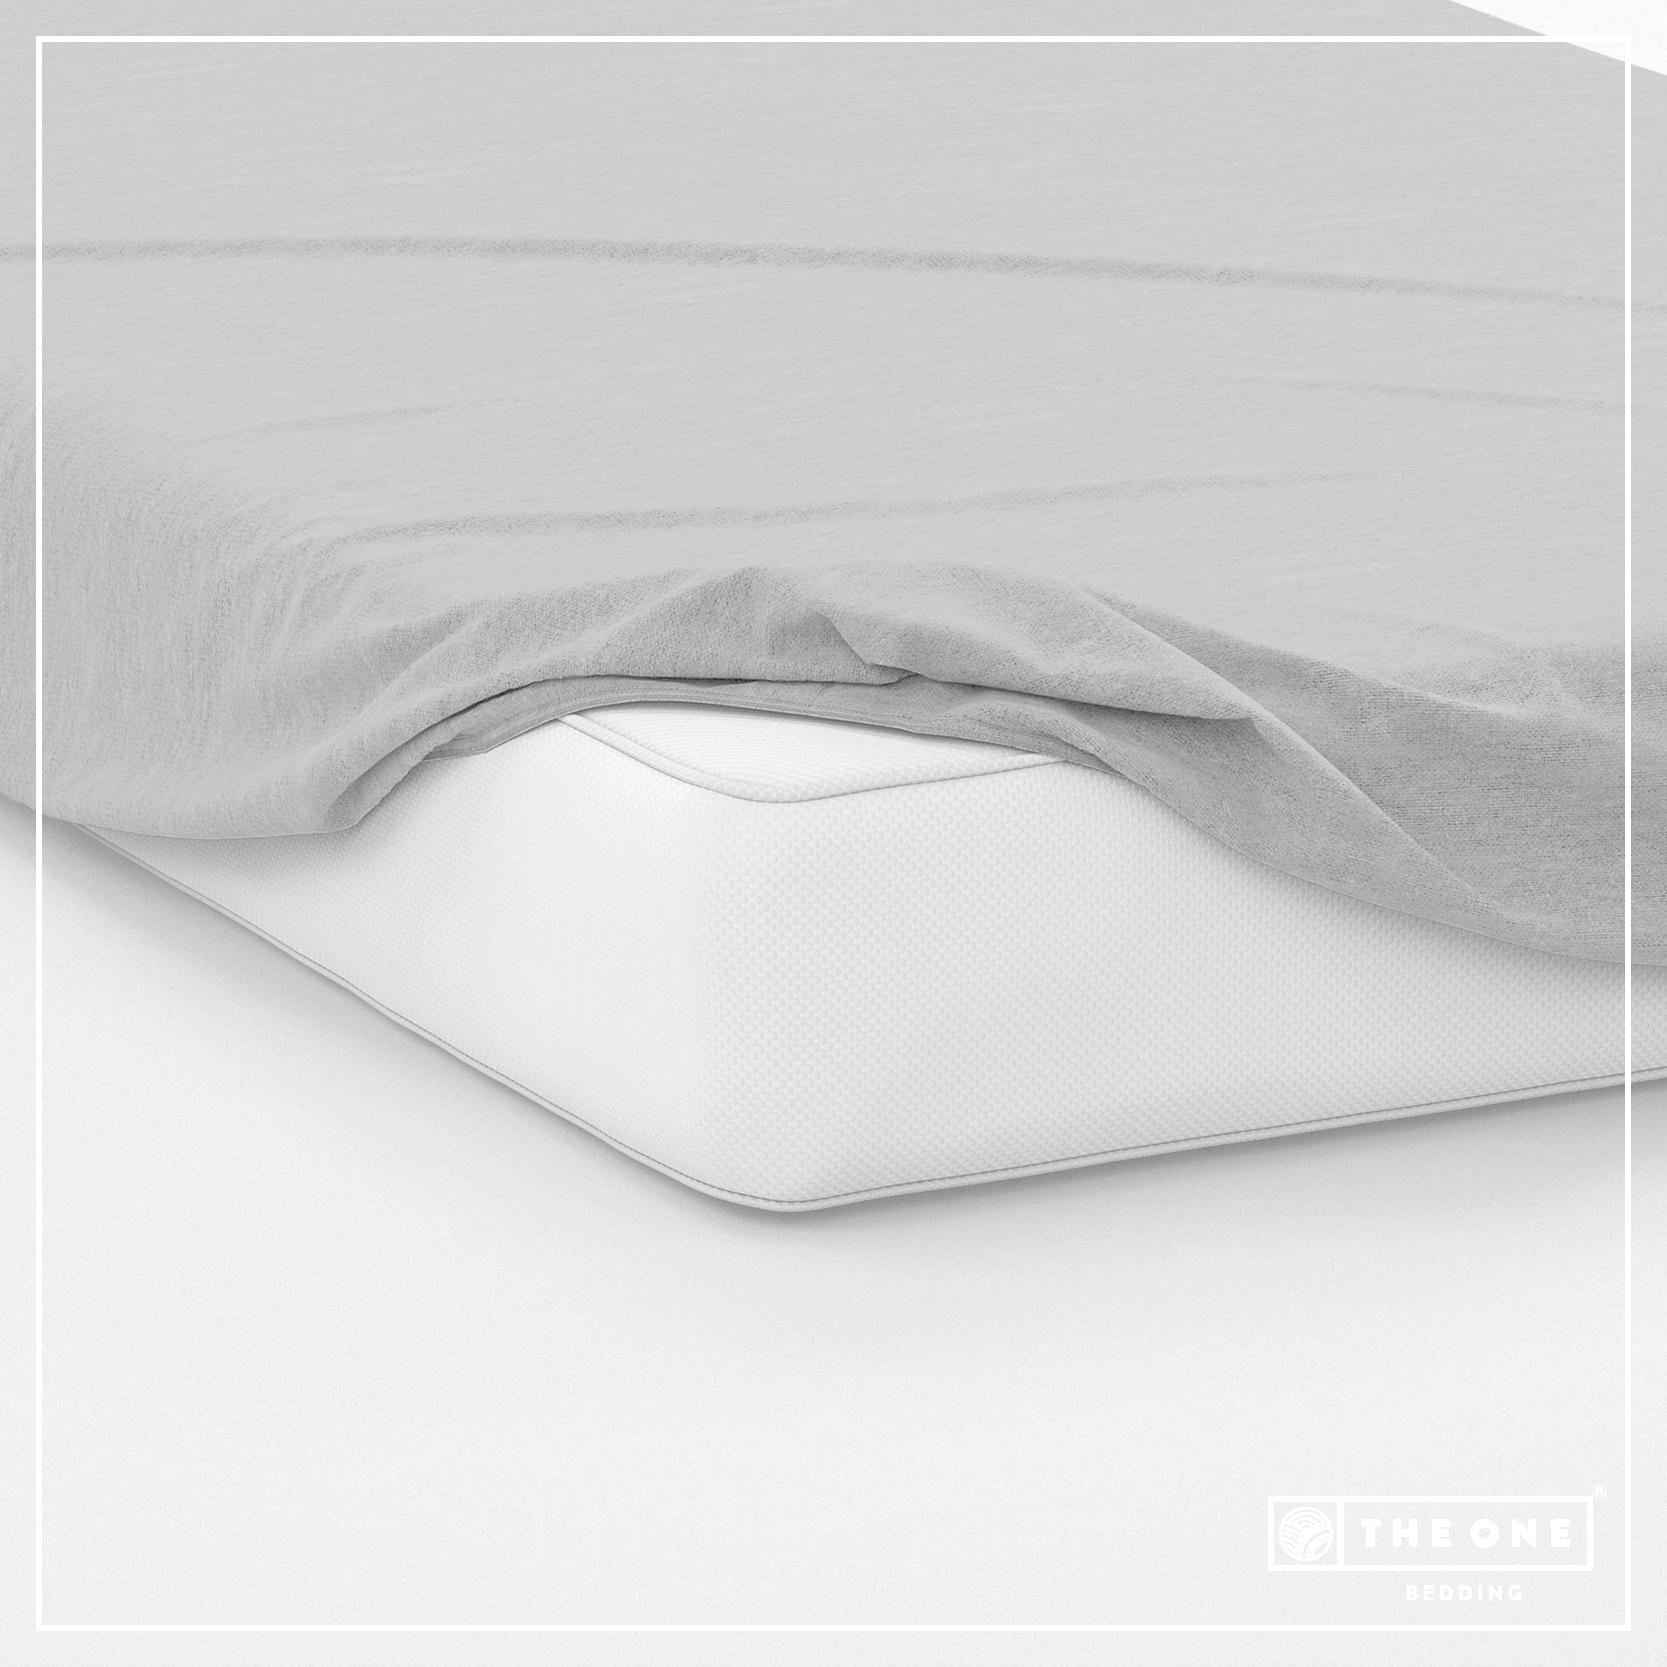 The One Hoeslaken Light Grey-100 x 220 cm